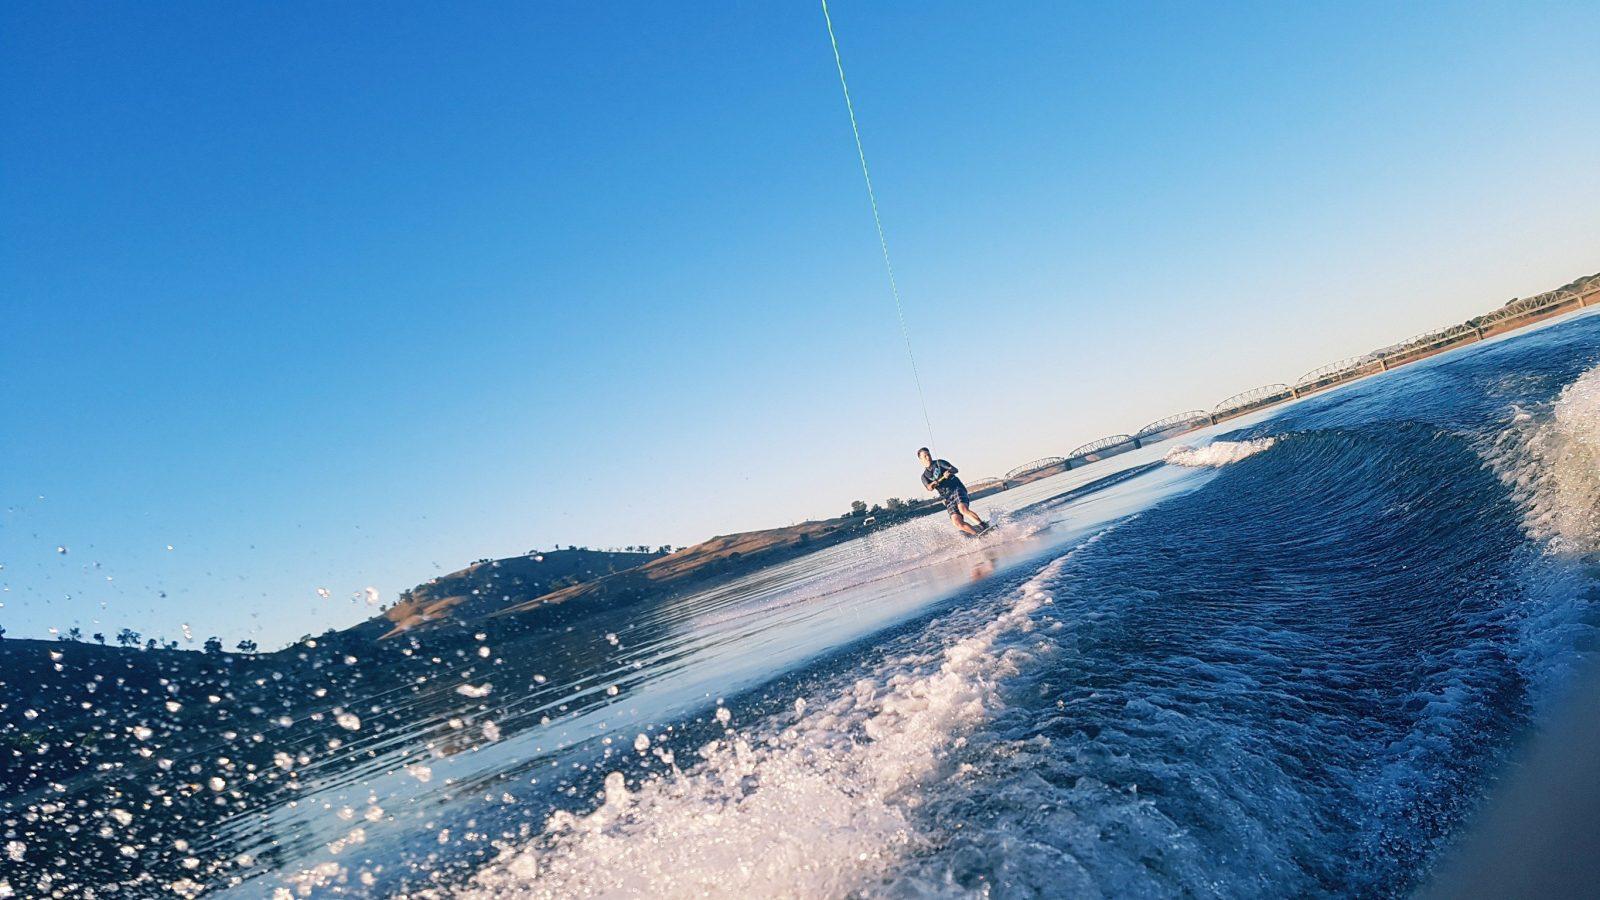 Wake boarding on Lake Hume